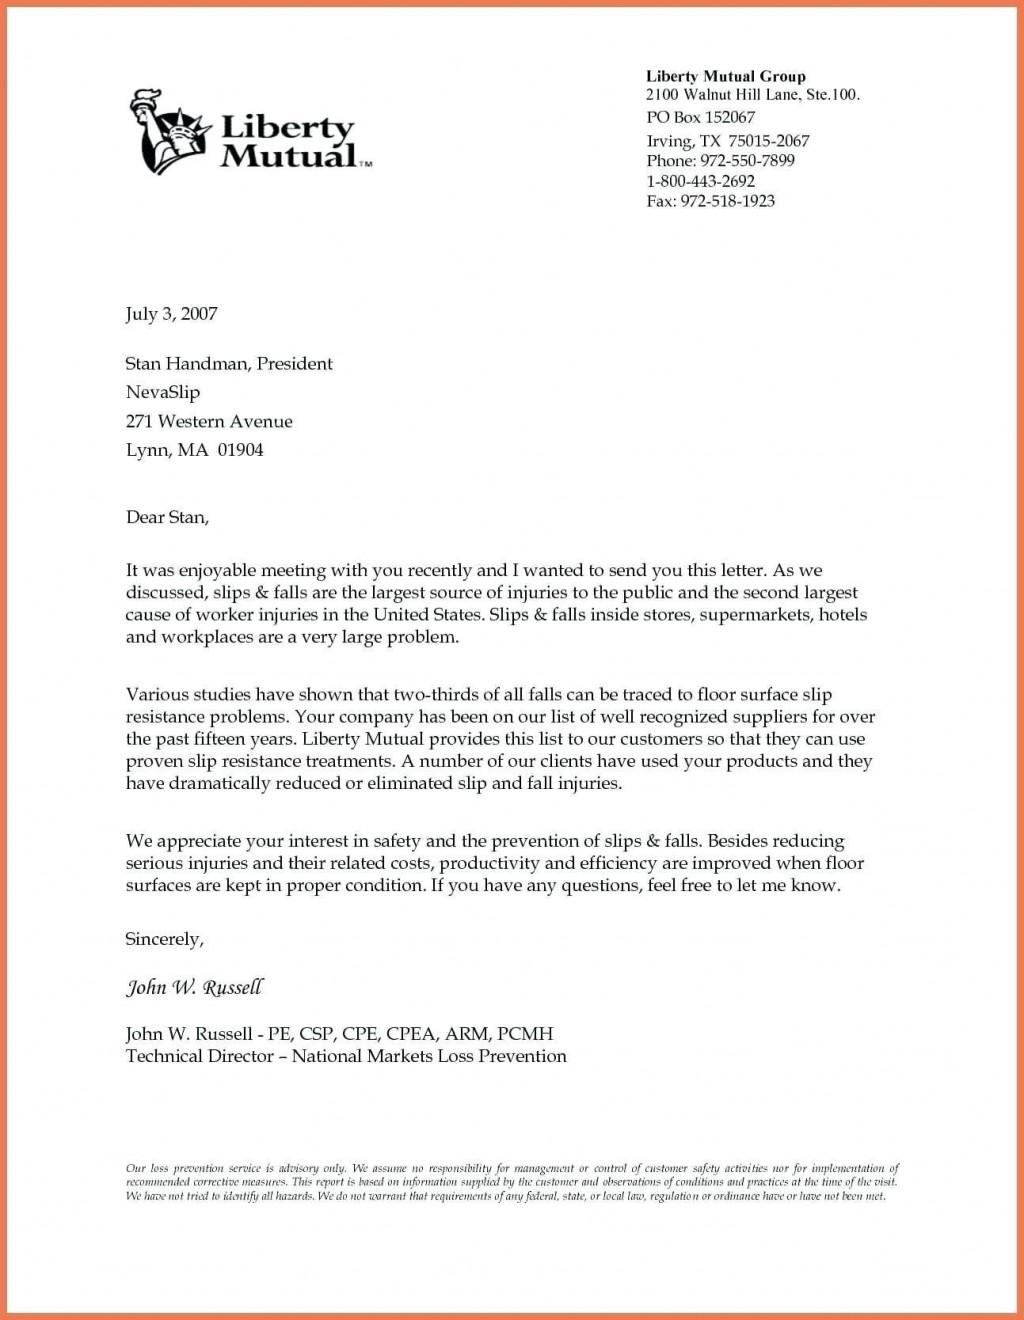 007 Unforgettable Formal Busines Letter Template High Definition  Pdf Australia FormatLarge